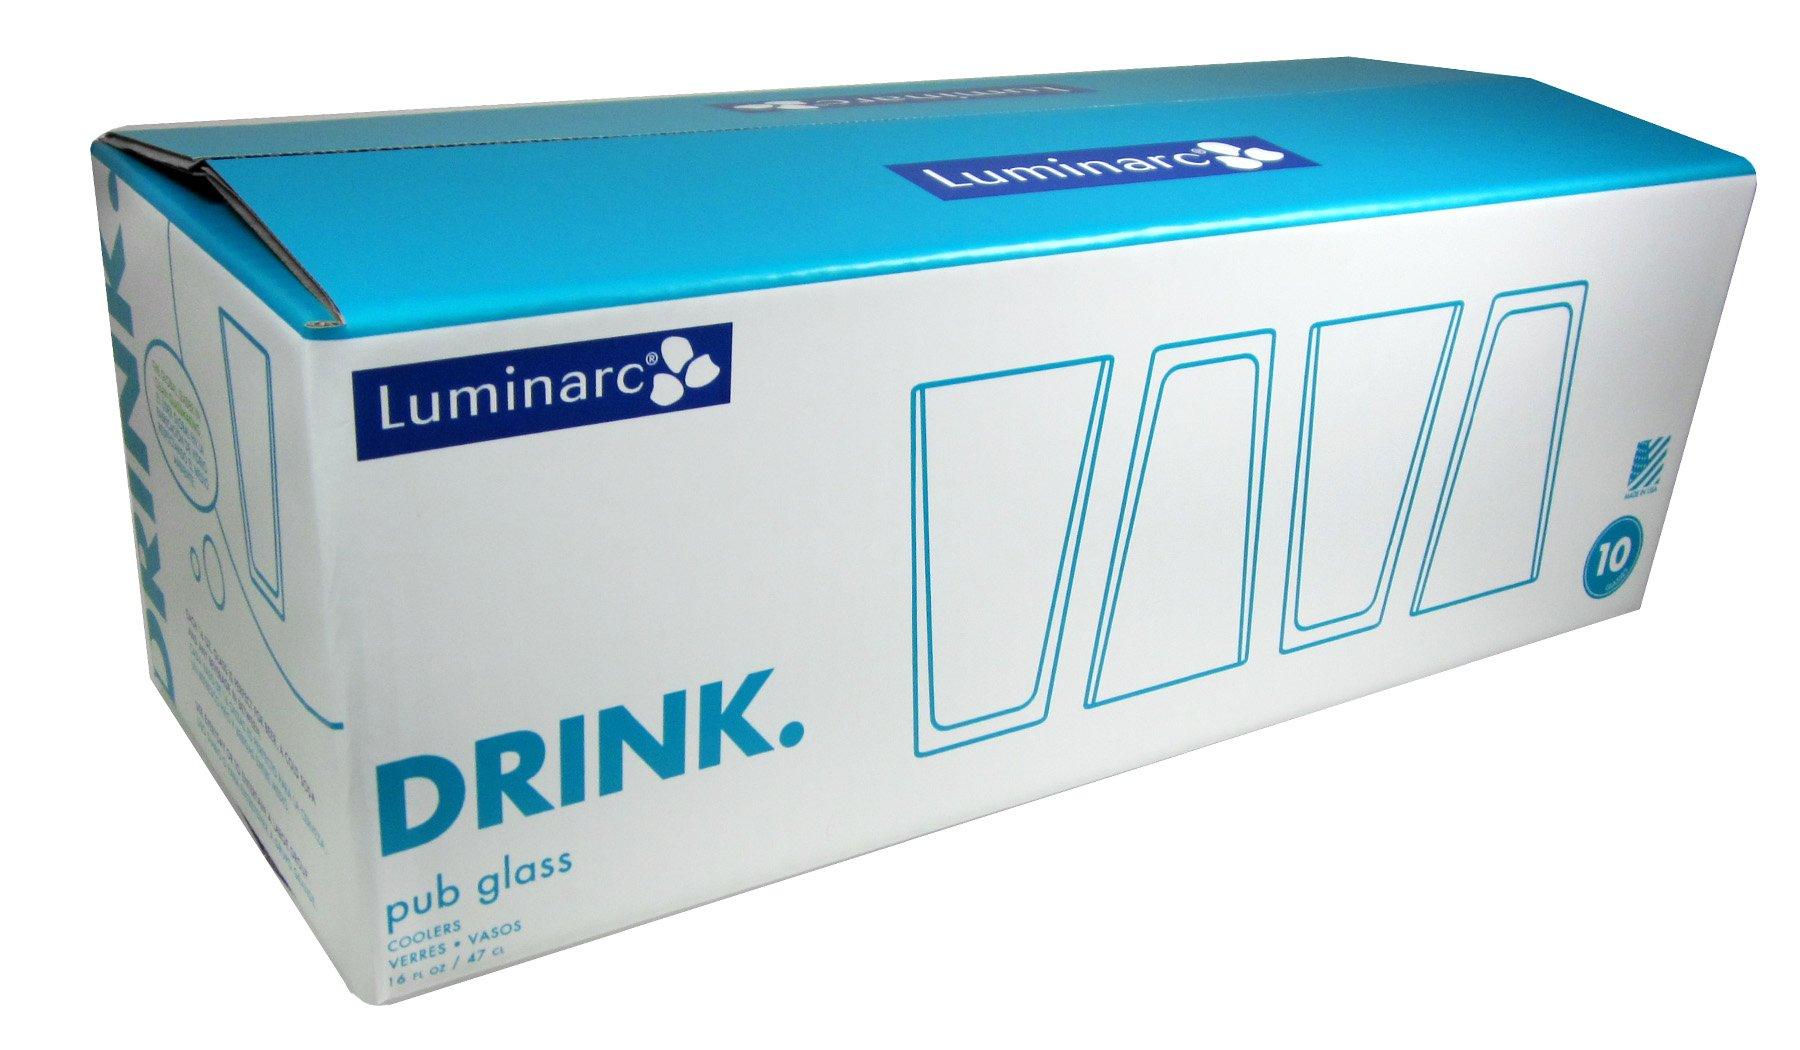 ARC International Luminarc Pub Beer Glass, 16-Ounce, Set of 10 by Arc International (Image #2)